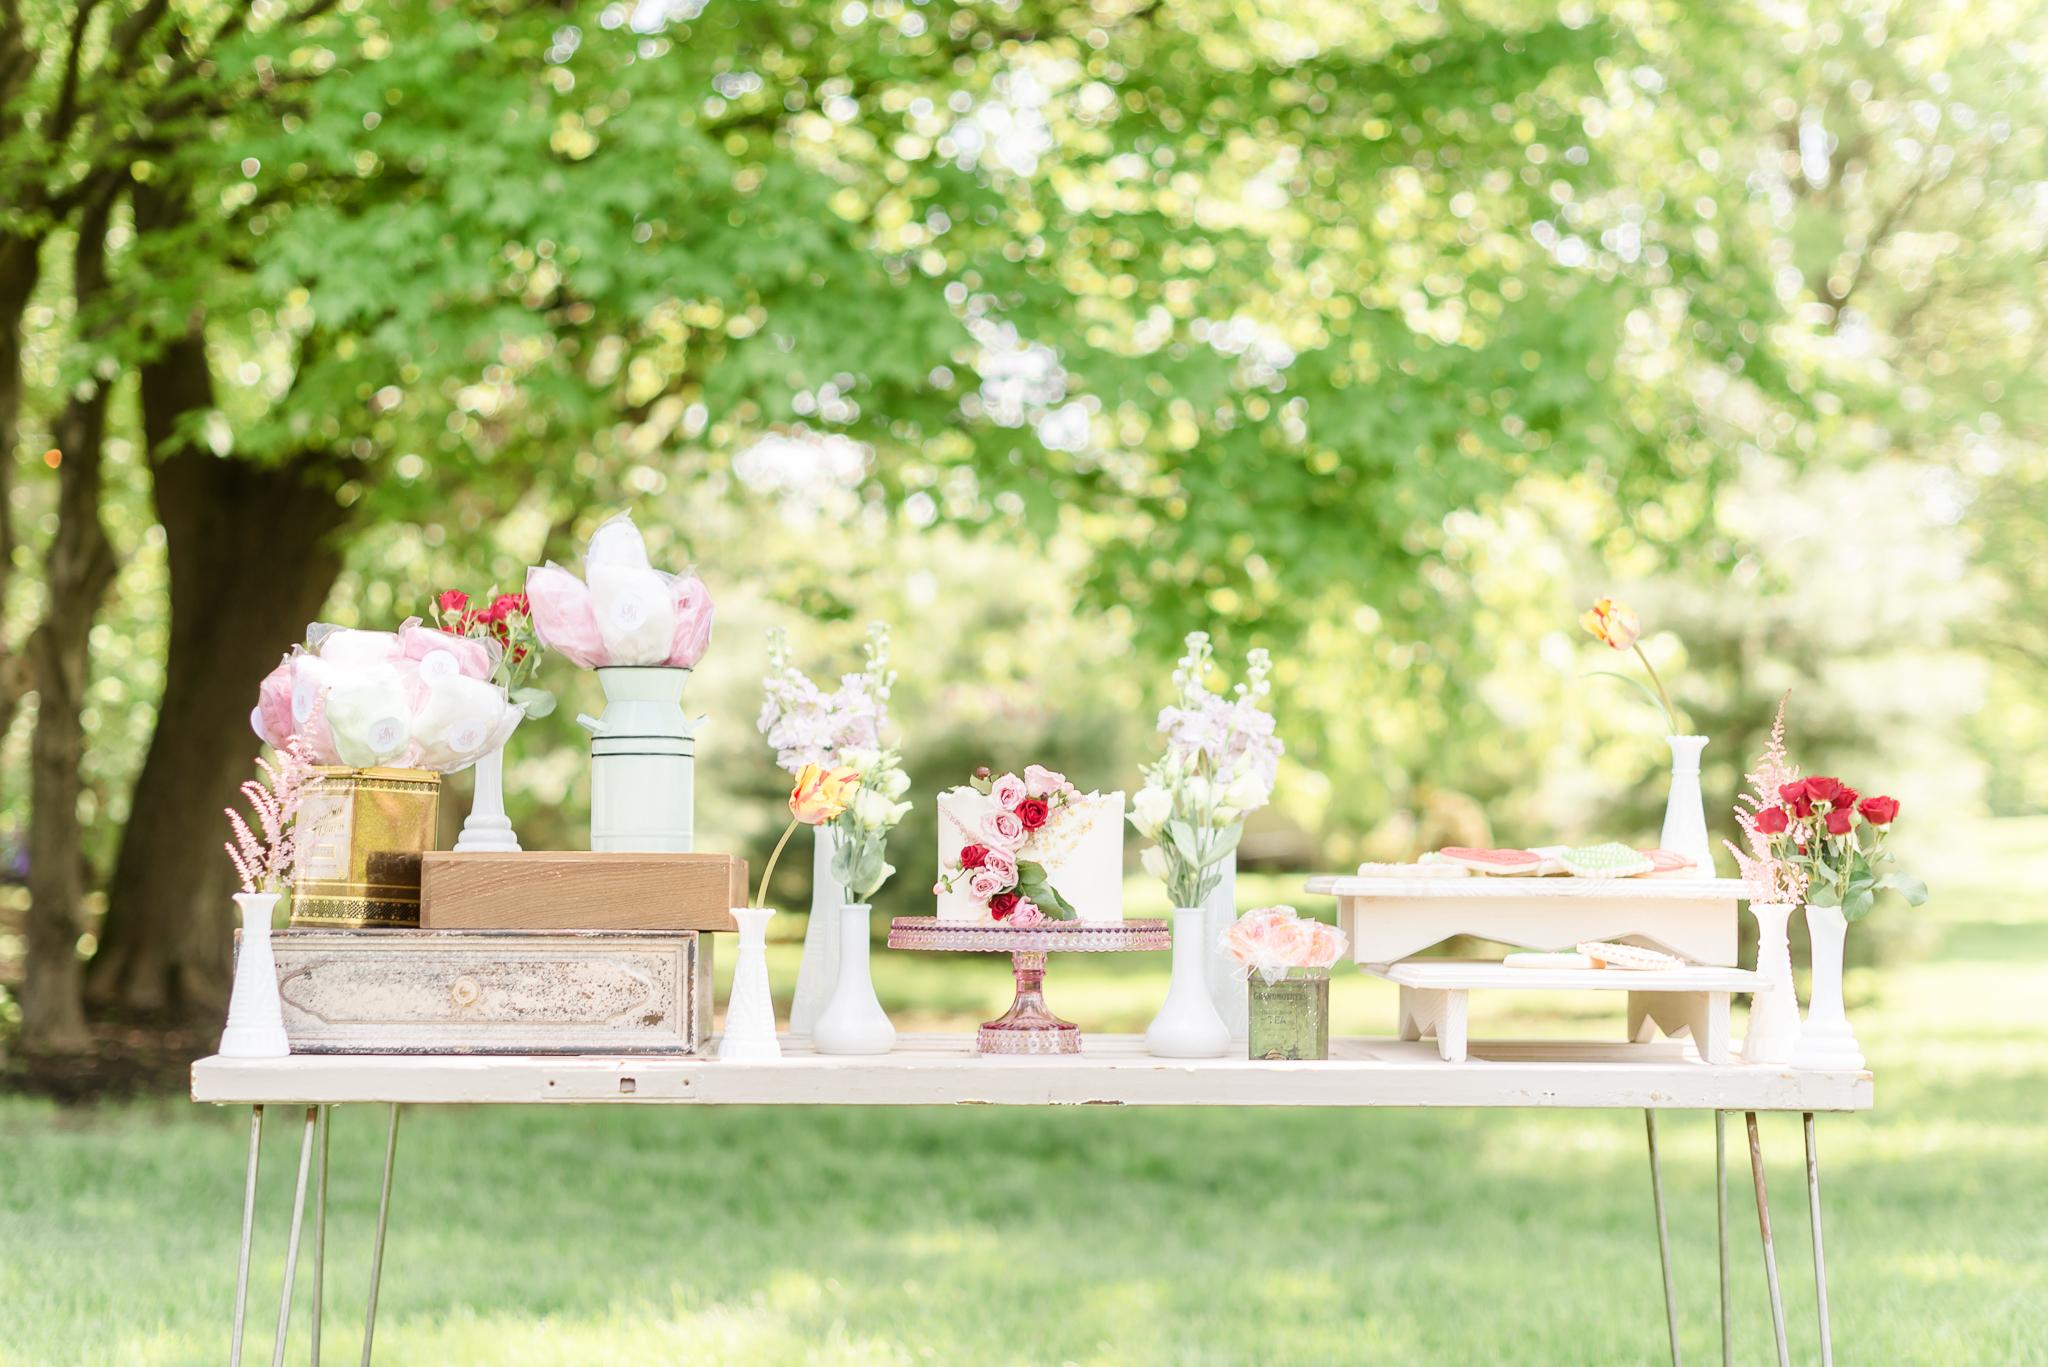 Mustard Seed Gardens Wedding Indianapolis Noblesvile Fishers Wedding Photographer-78.jpg